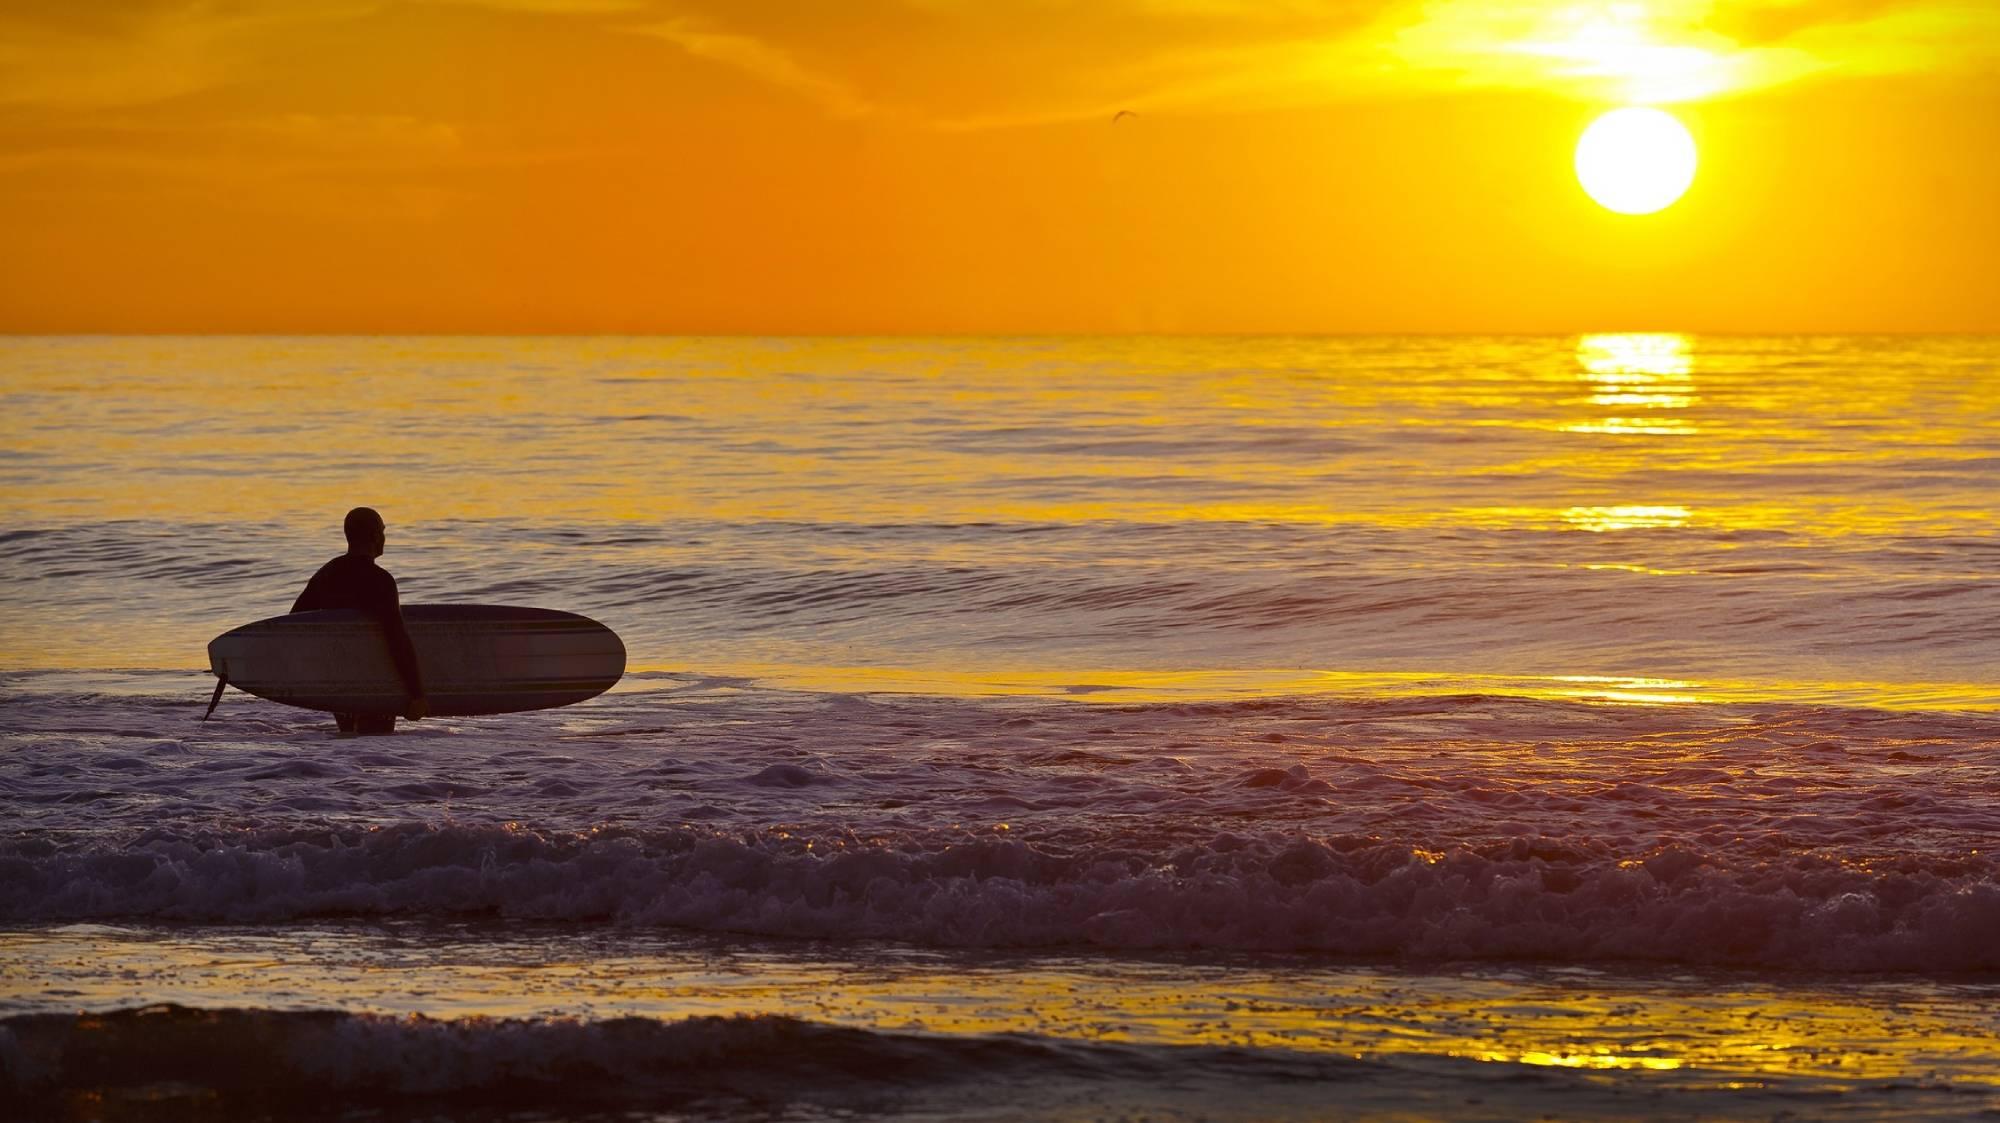 San Diego - Travel Blog